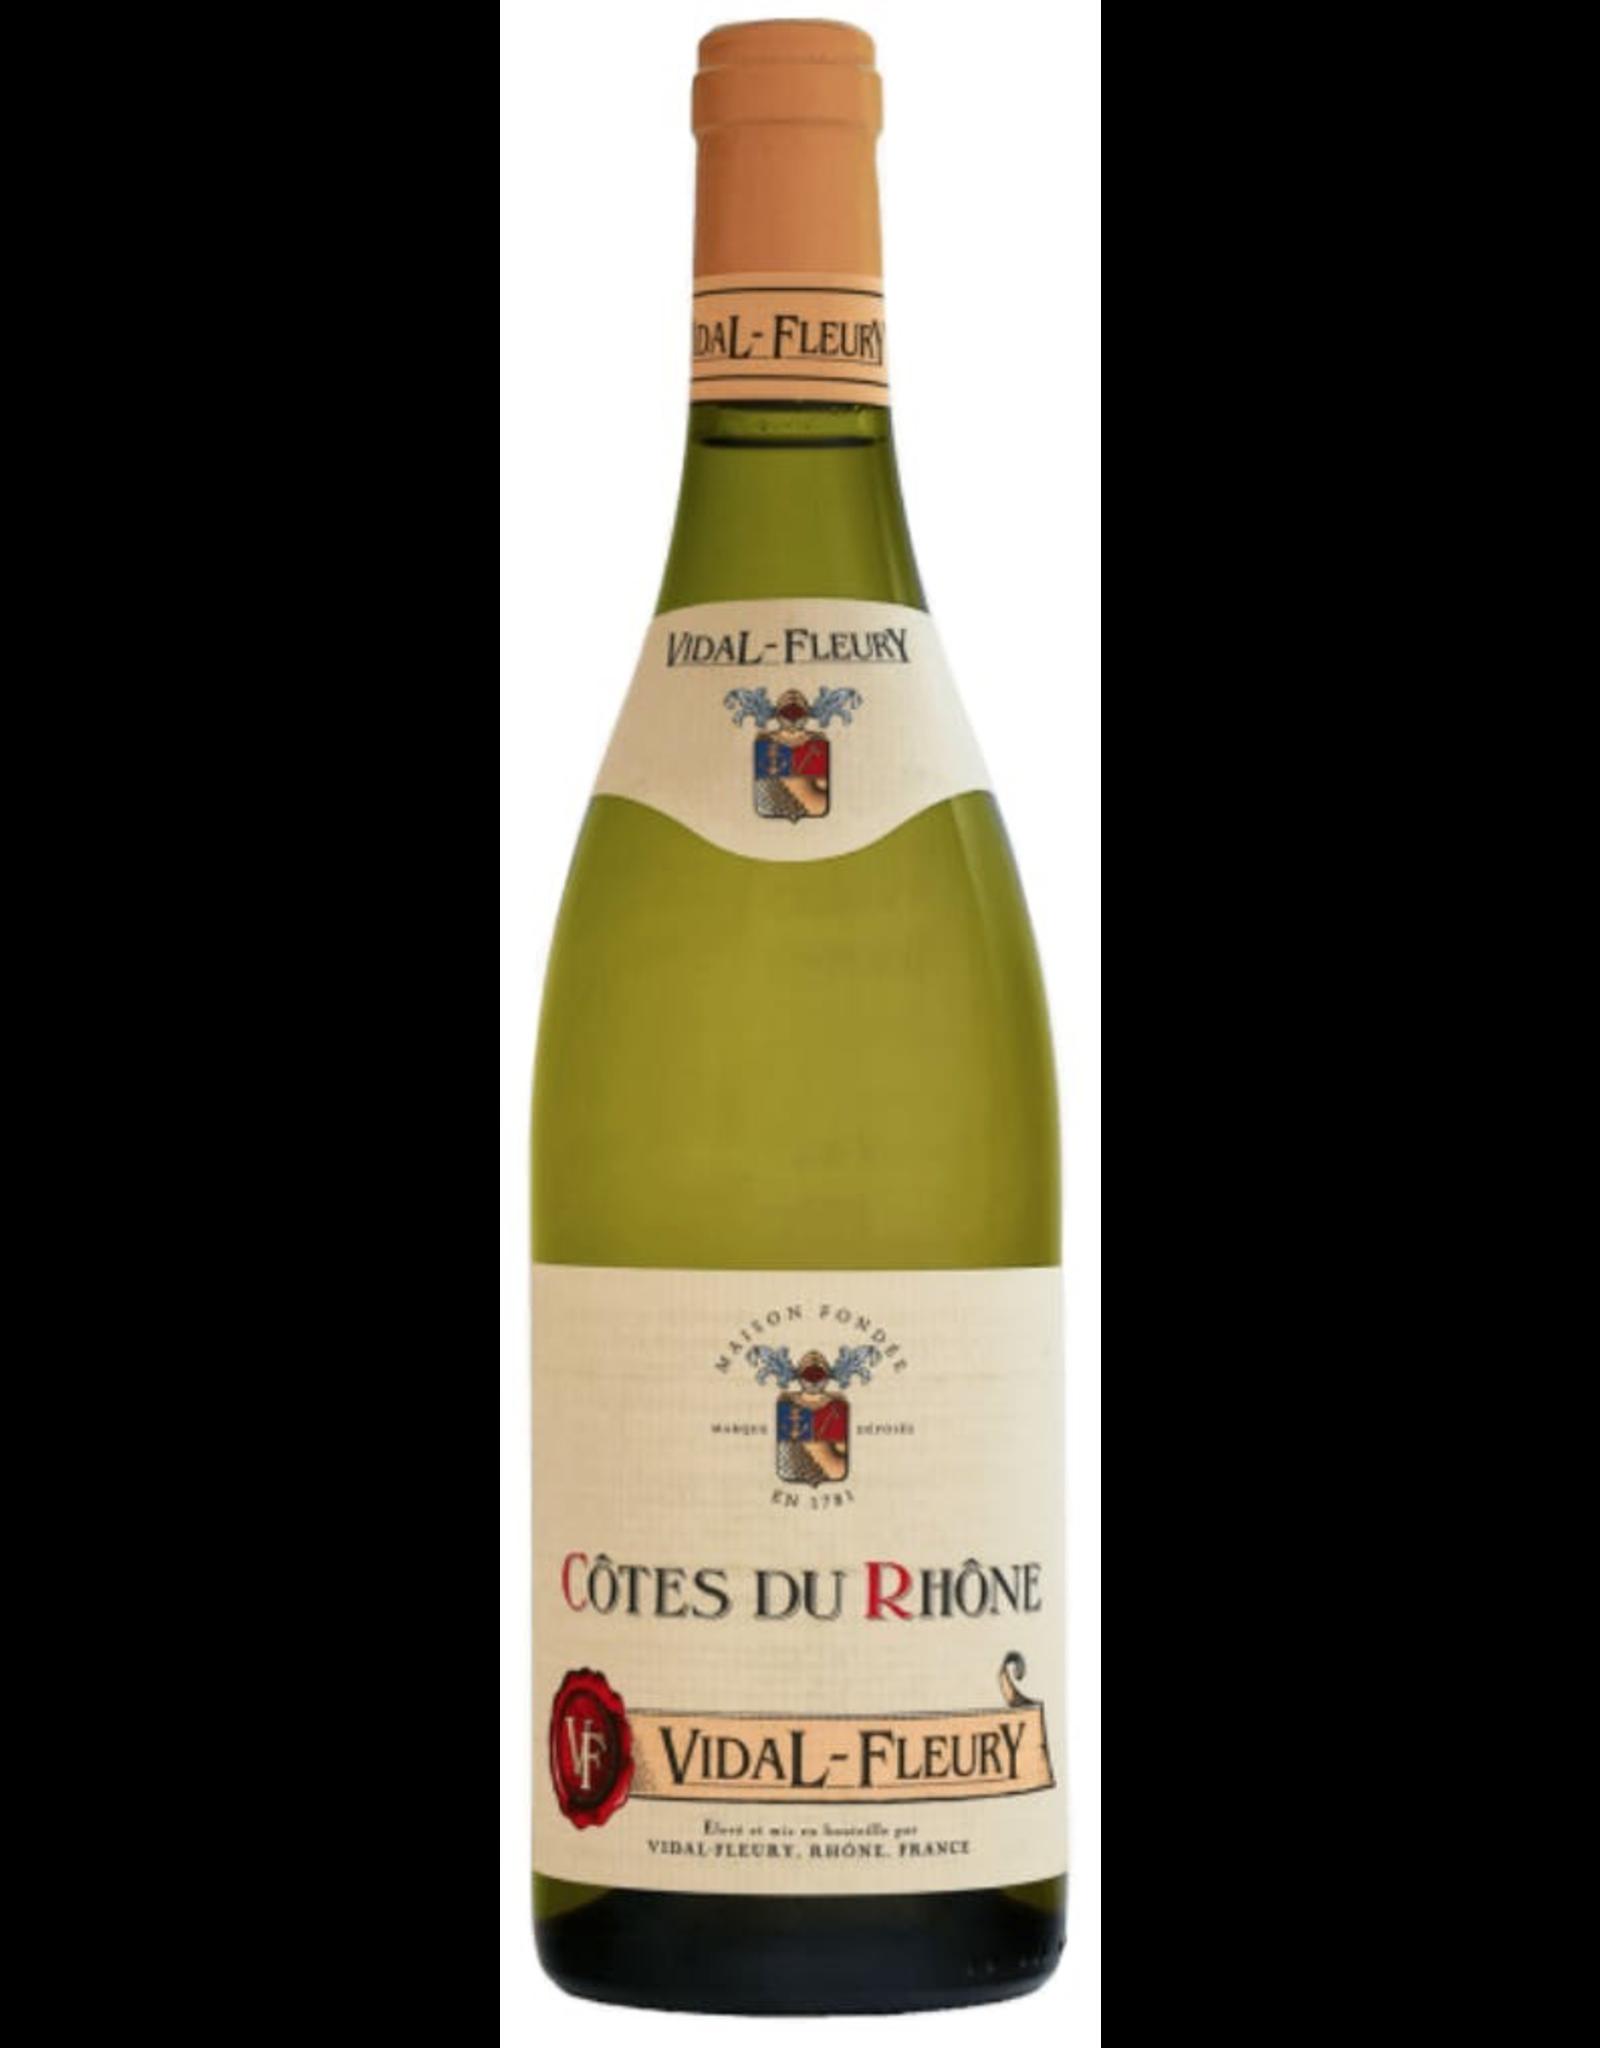 White Wine 2015, Vidal-Fleury Cotes Du Rhone Blanc, WHITE Rhone Blend, Cotes du Rhone, Rhone Valley, France, 14% Alc, CT87.1, TW90